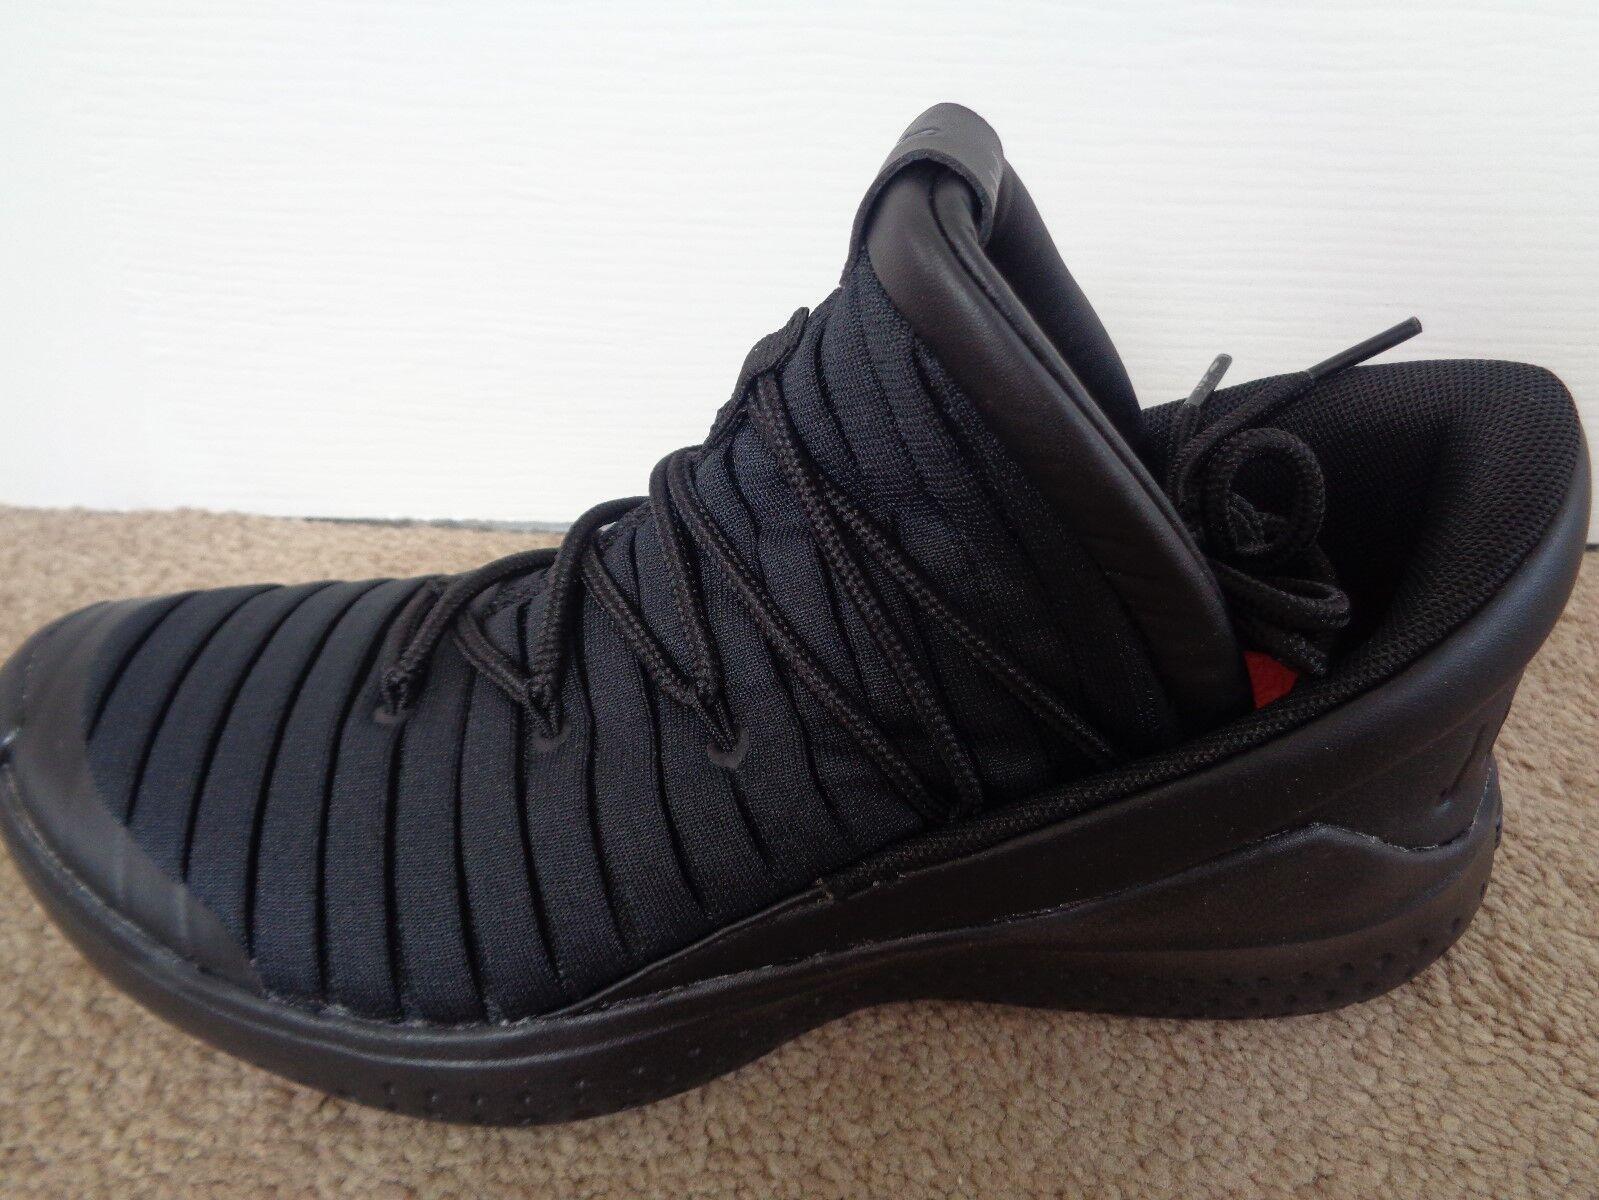 Nike jordan flug luxe ausbilder schuhe 919715 919715 919715 011 eu 40,5 uns 7,5 neue + box 935da7